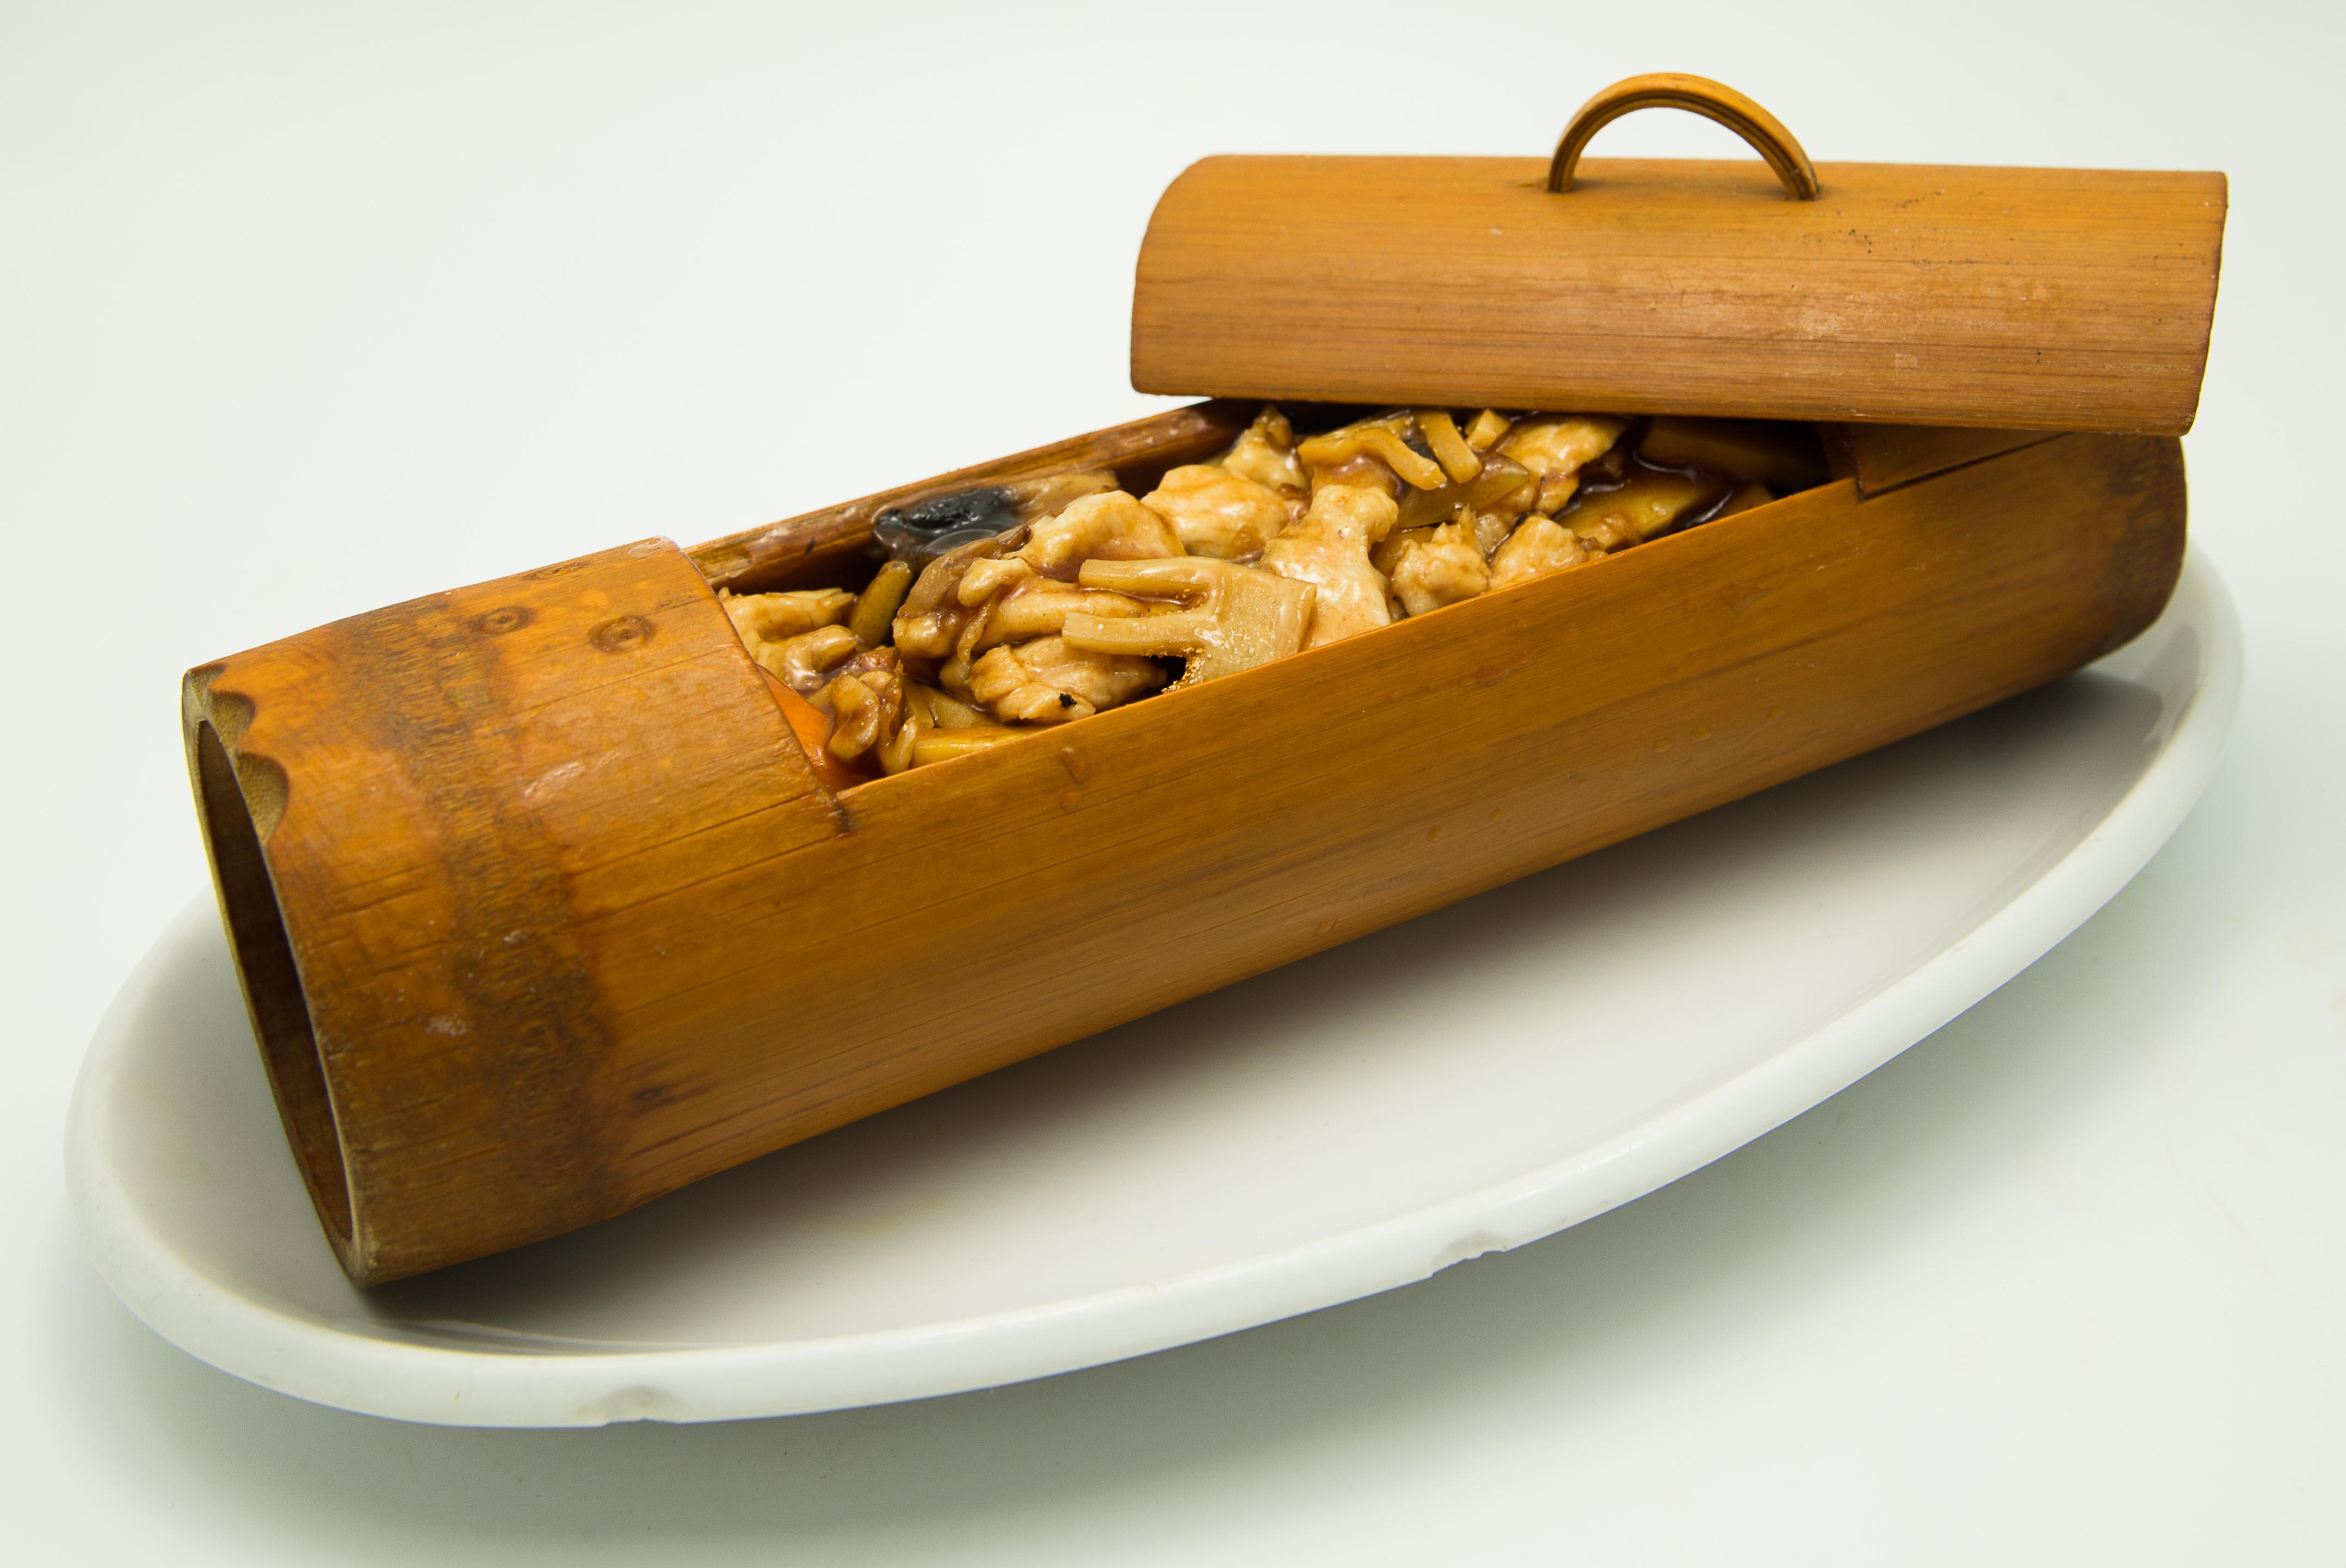 carne-de-pui-in-coaja-de-banbus